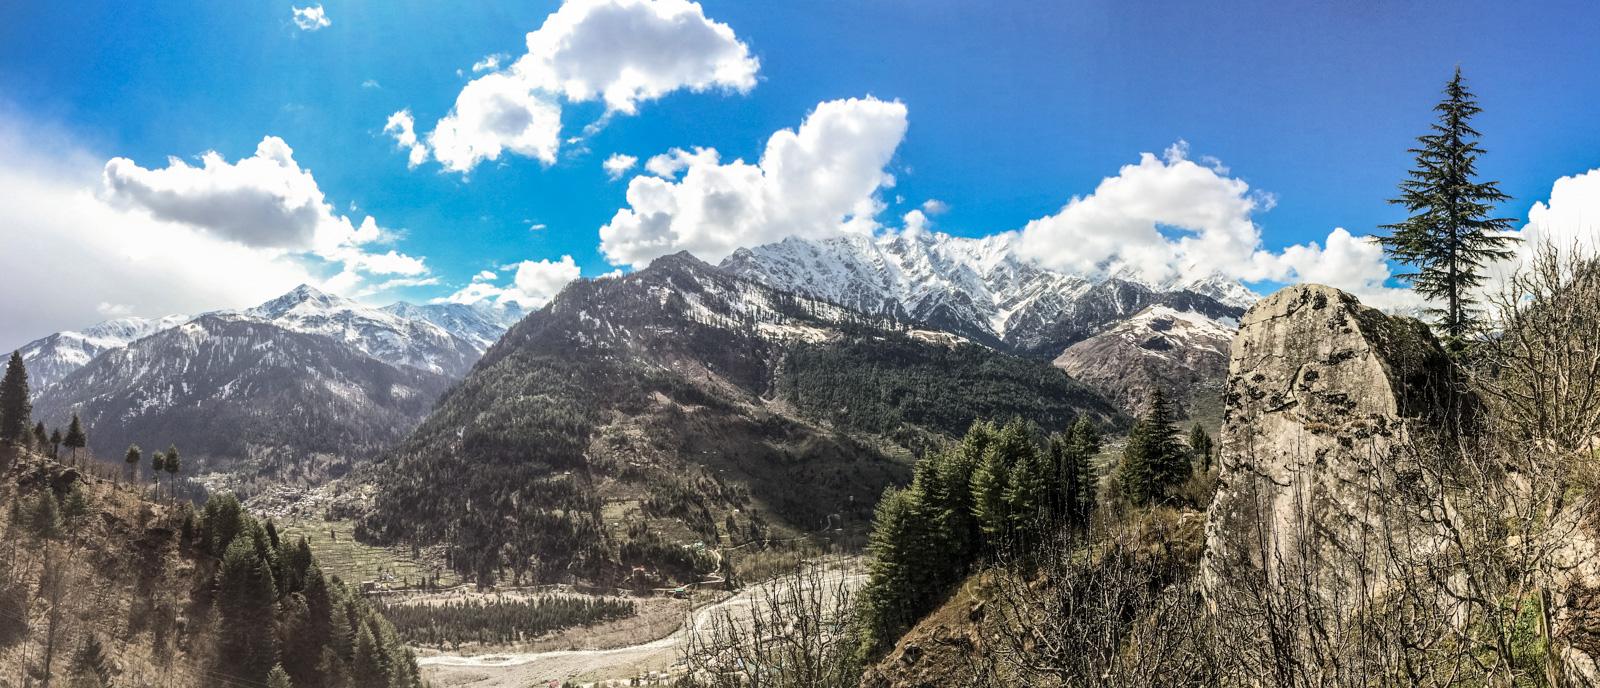 Manali-HimachalPradesh-India-iphone-AmyRolloPhoto-4745.jpg